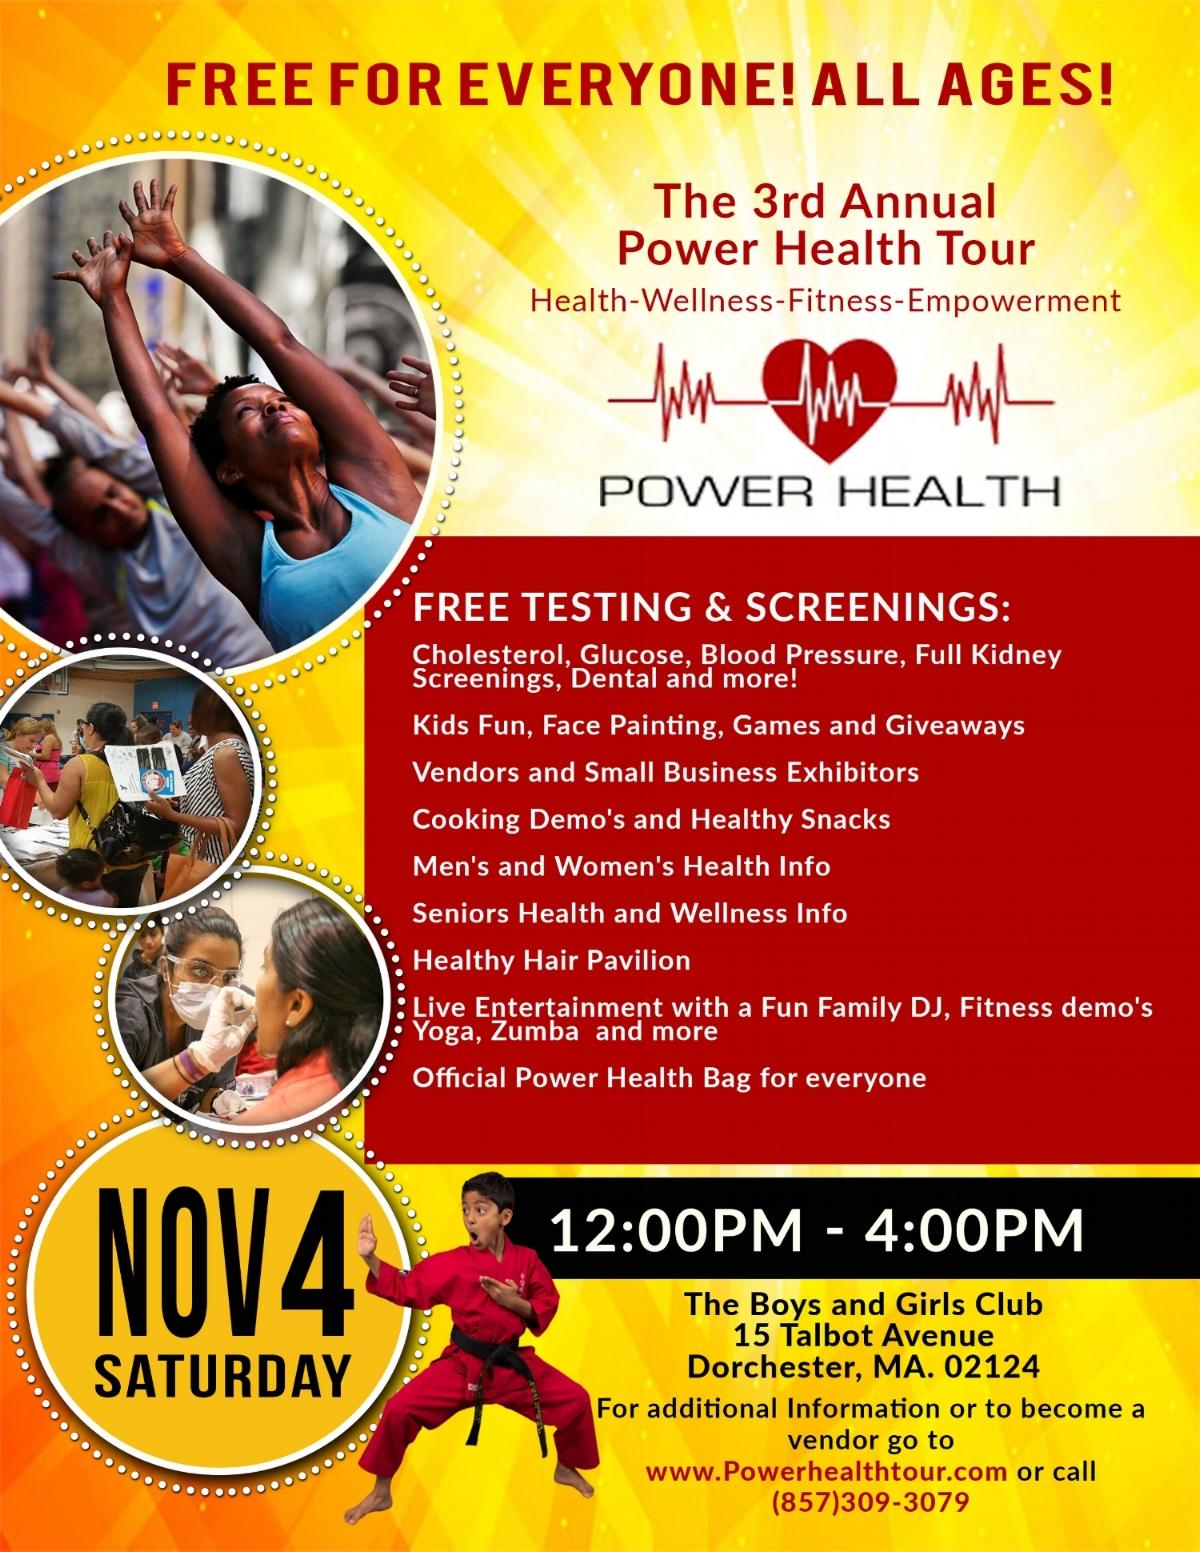 Power Health Tour November 4, 2017.jpg